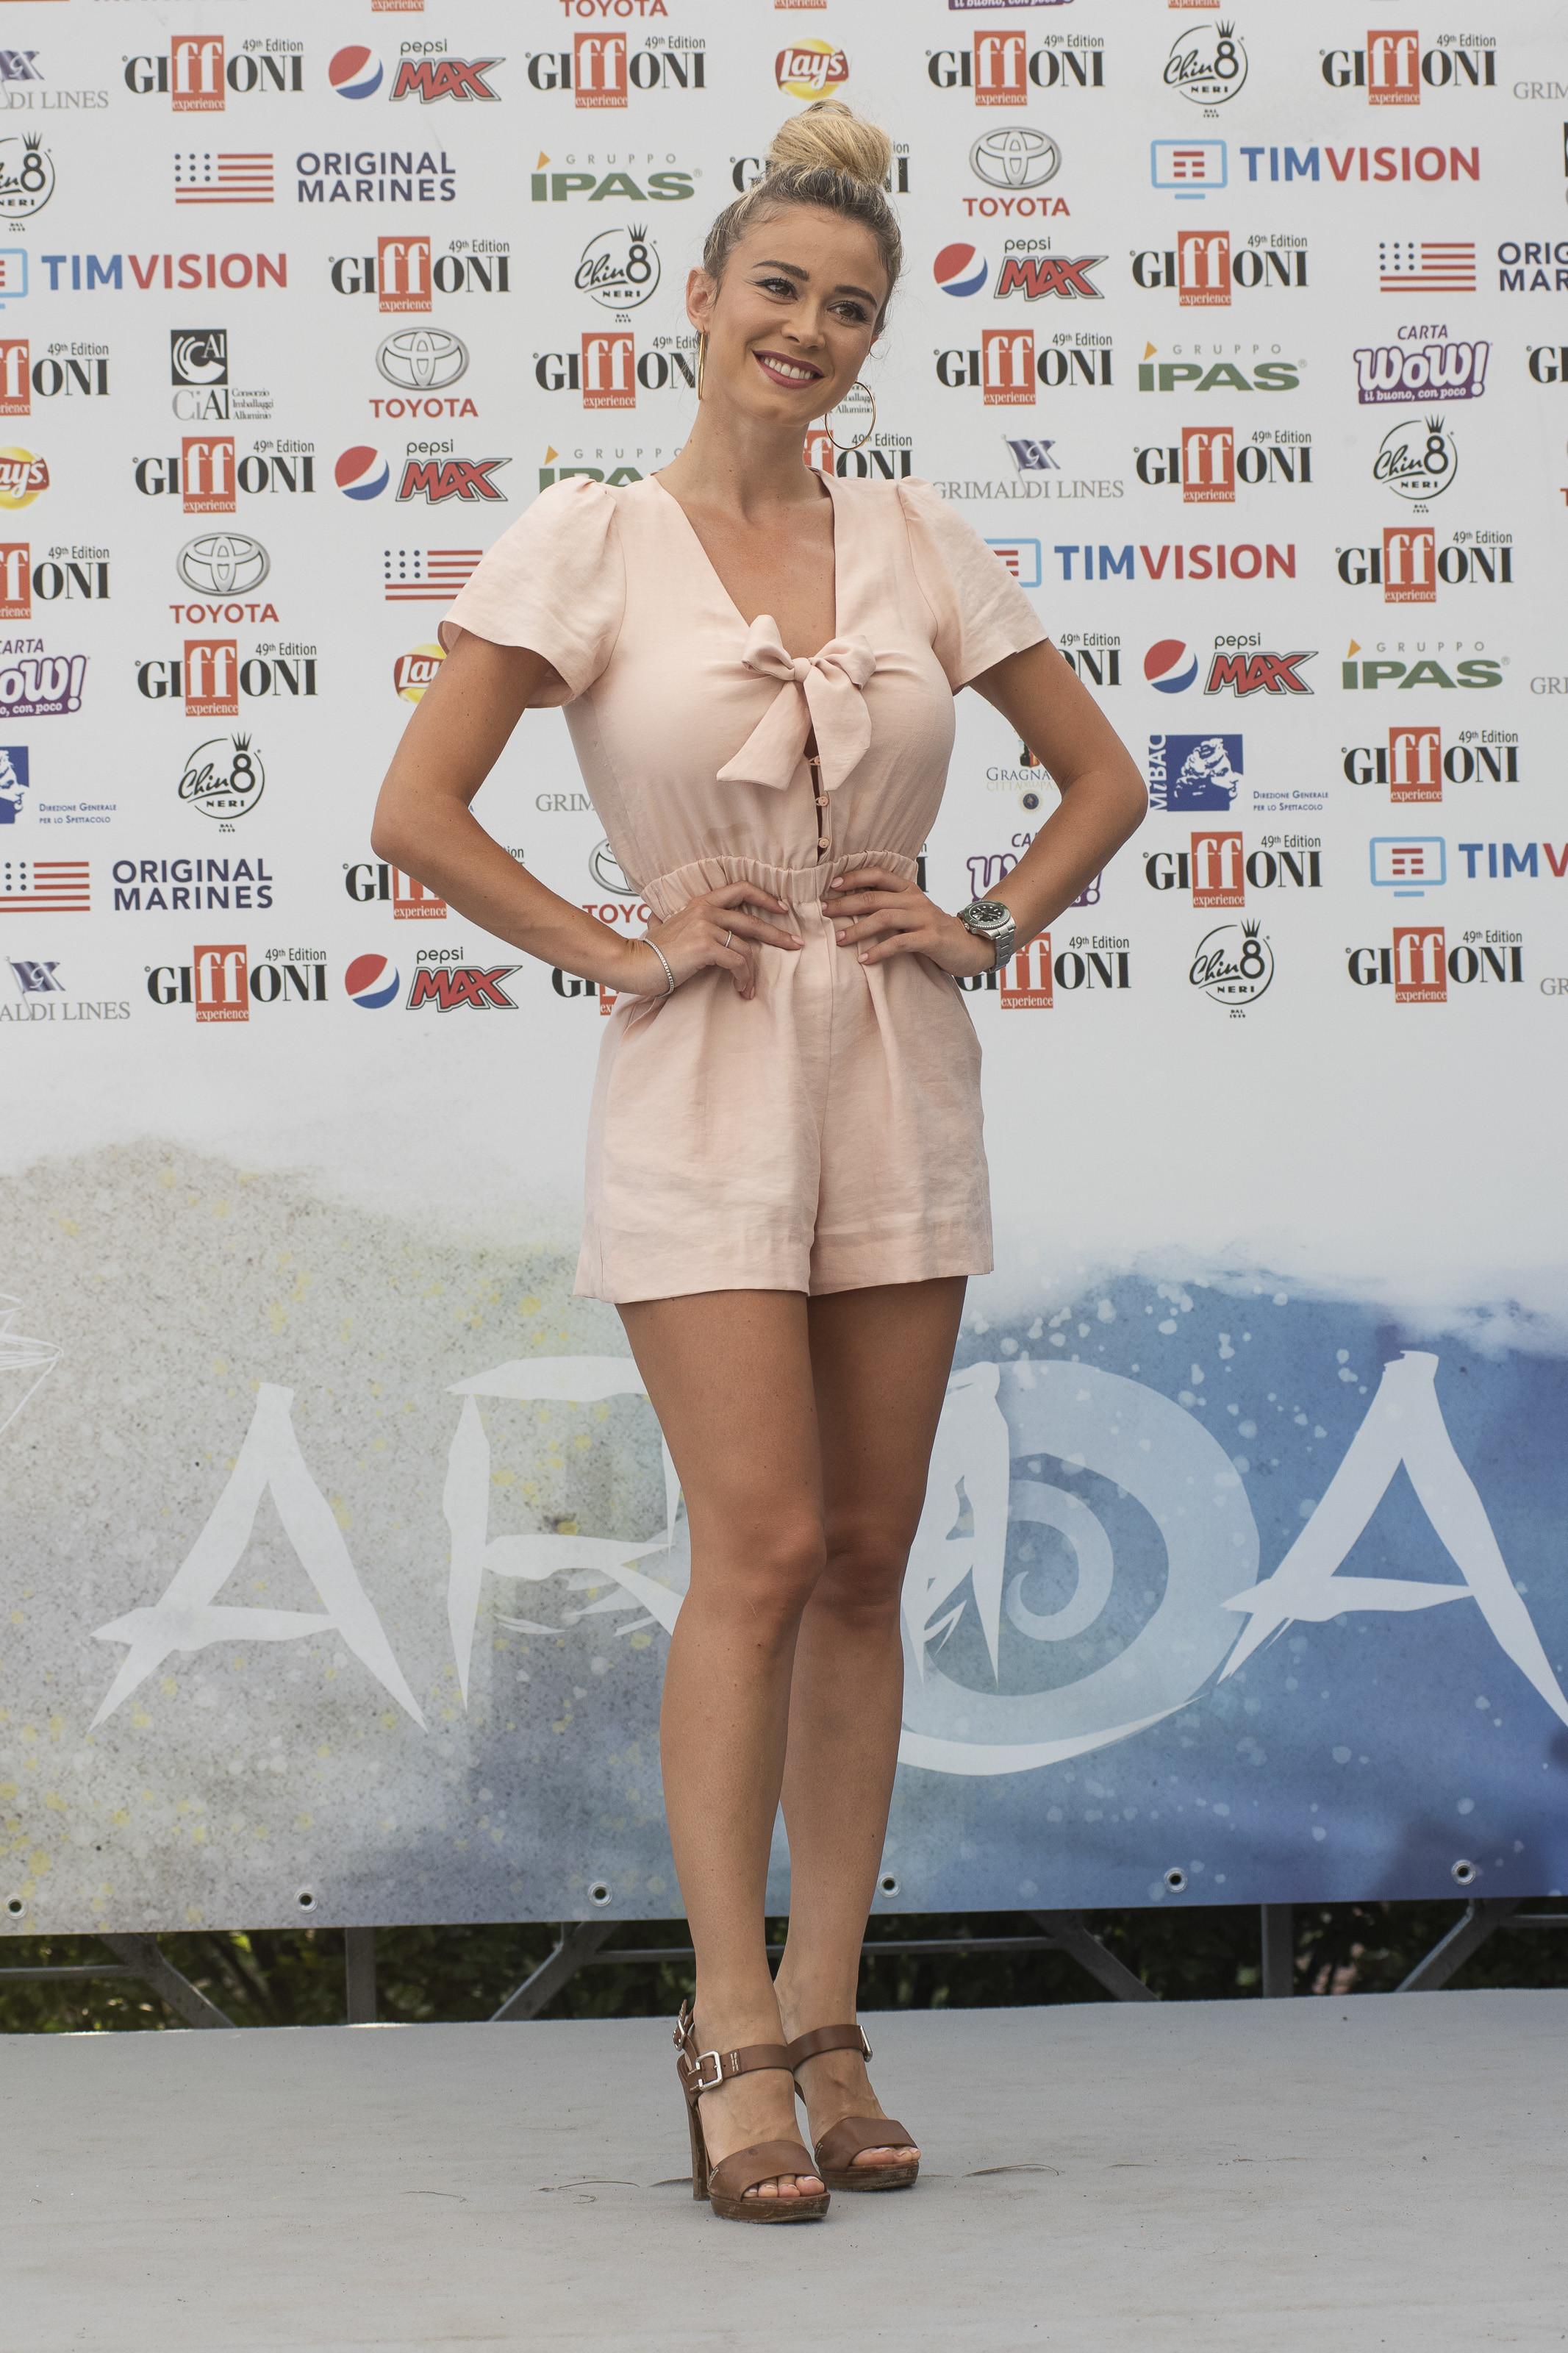 Diletta Leotta al Giffoni Film Festival 2019